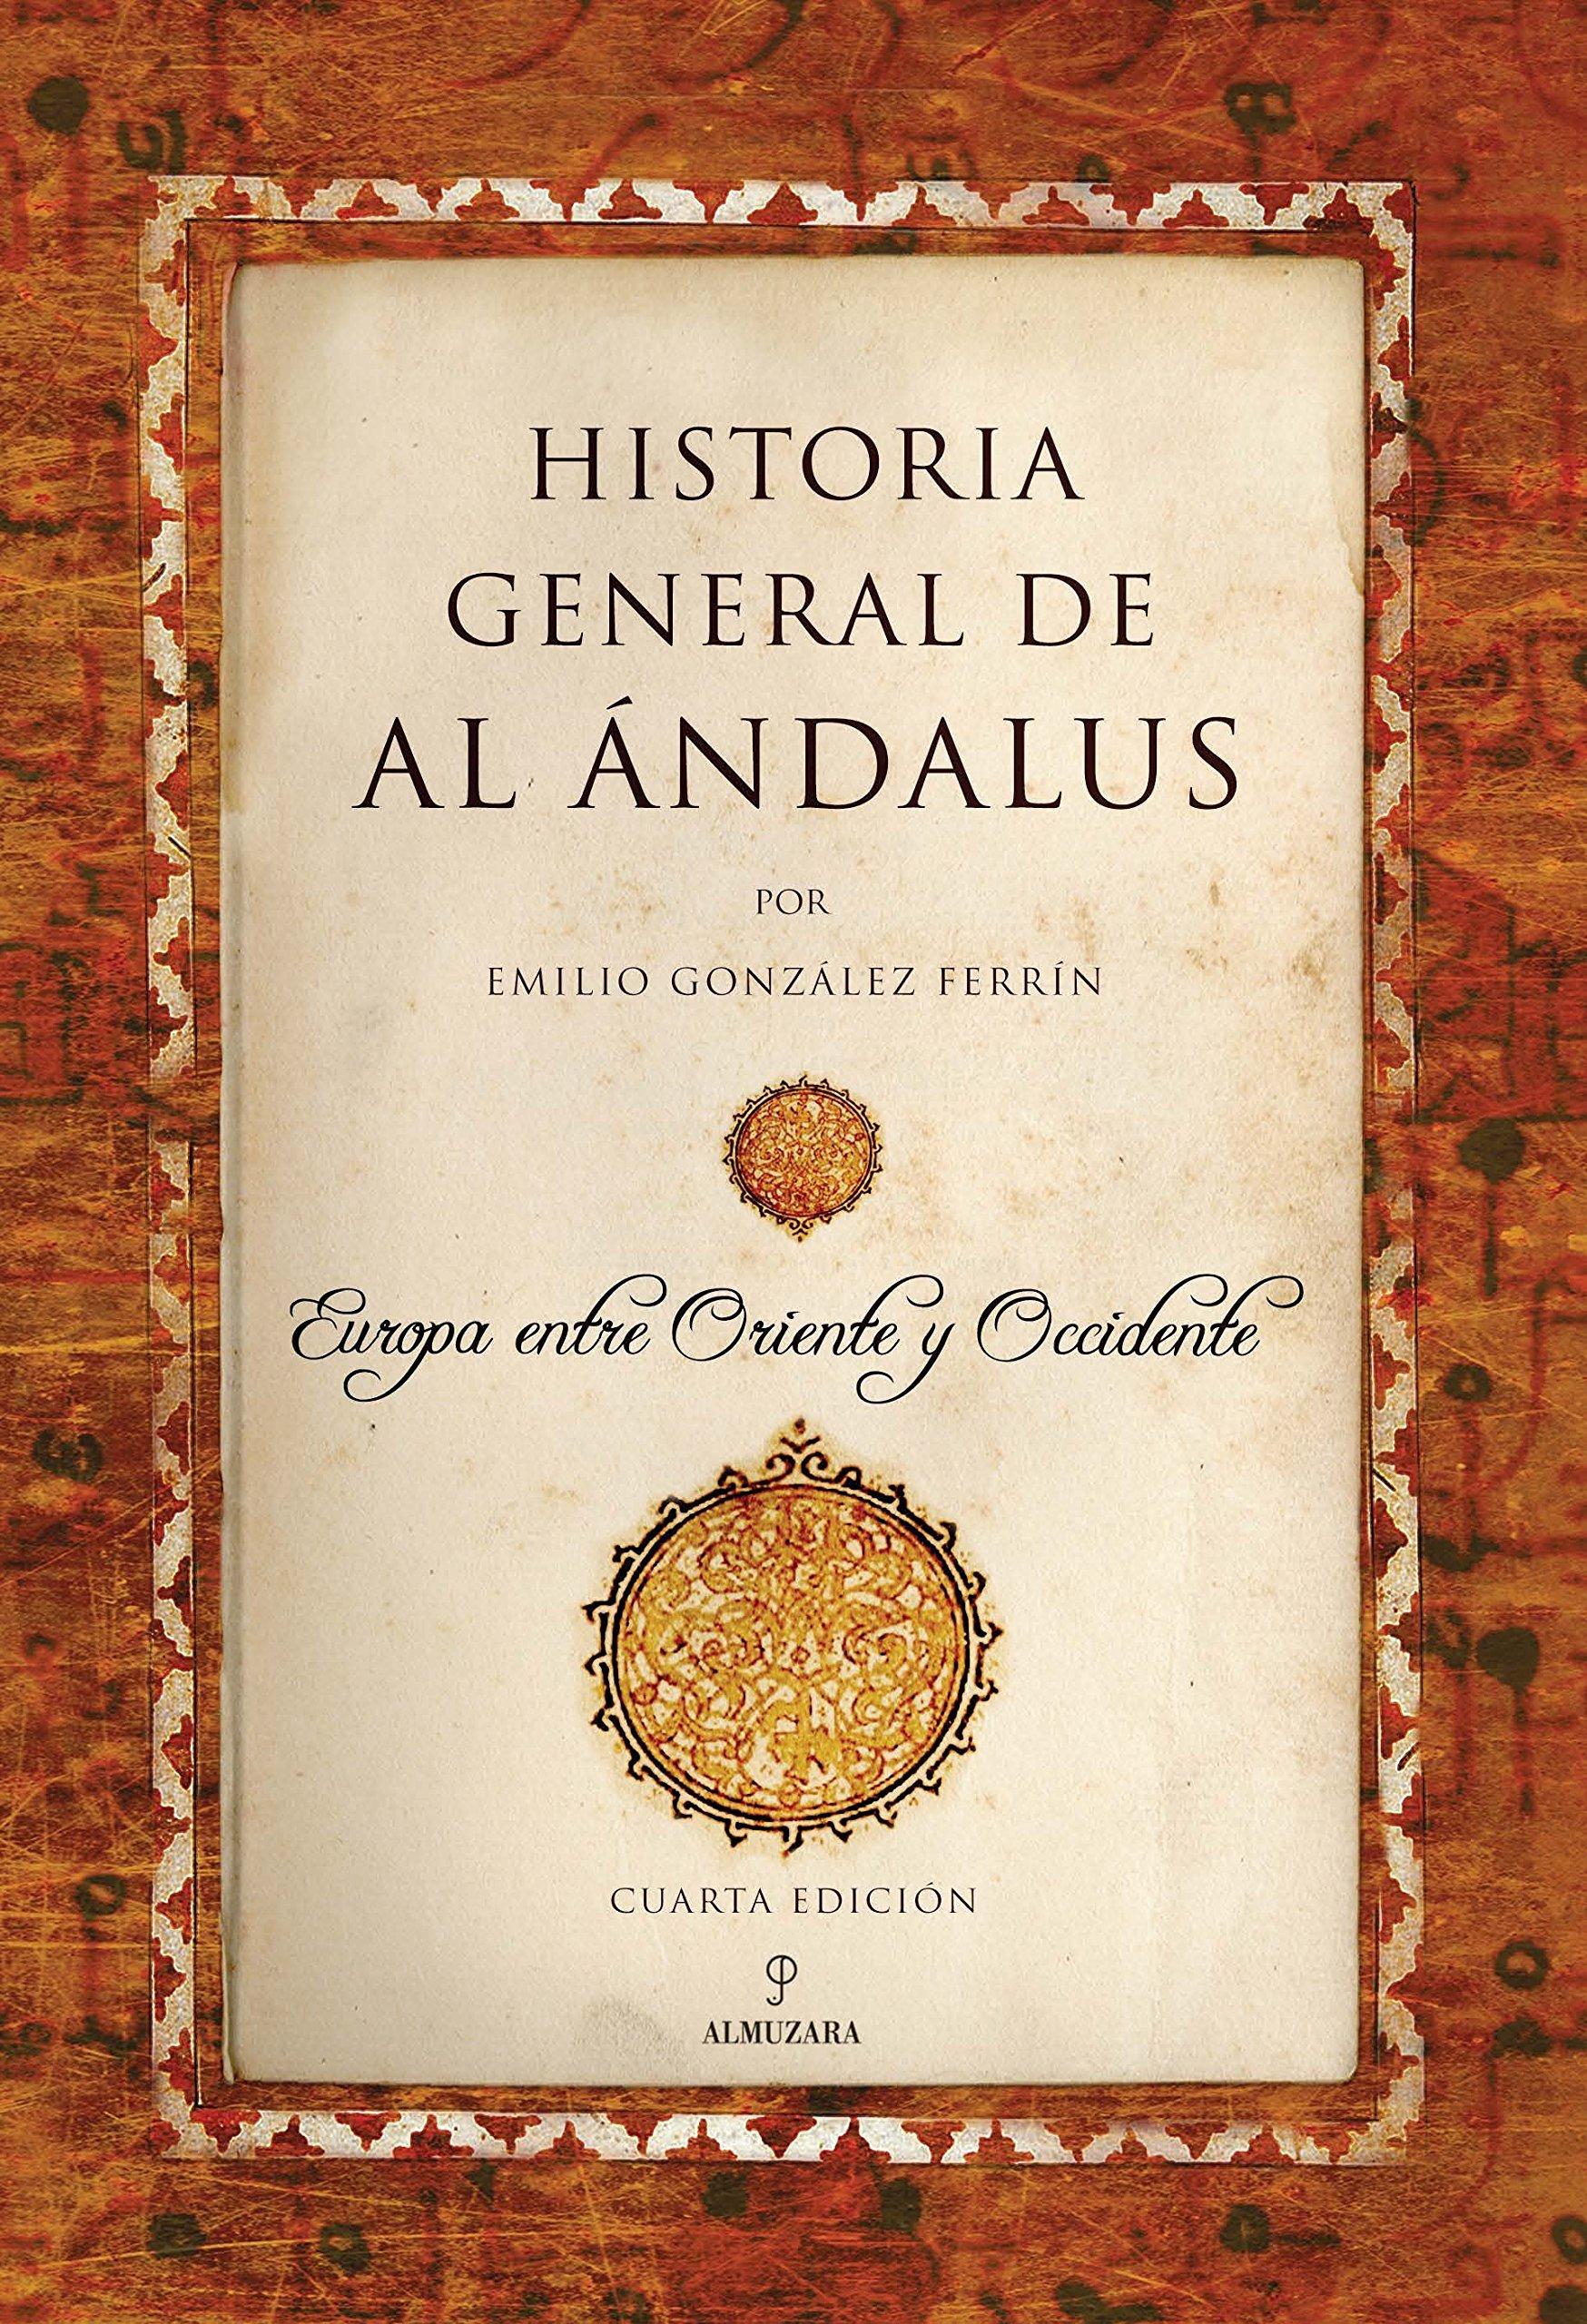 Historia General De Al Andalus (N. Ed.) (Al Ándalus): Amazon.es: González Ferrín, Emilio: Libros